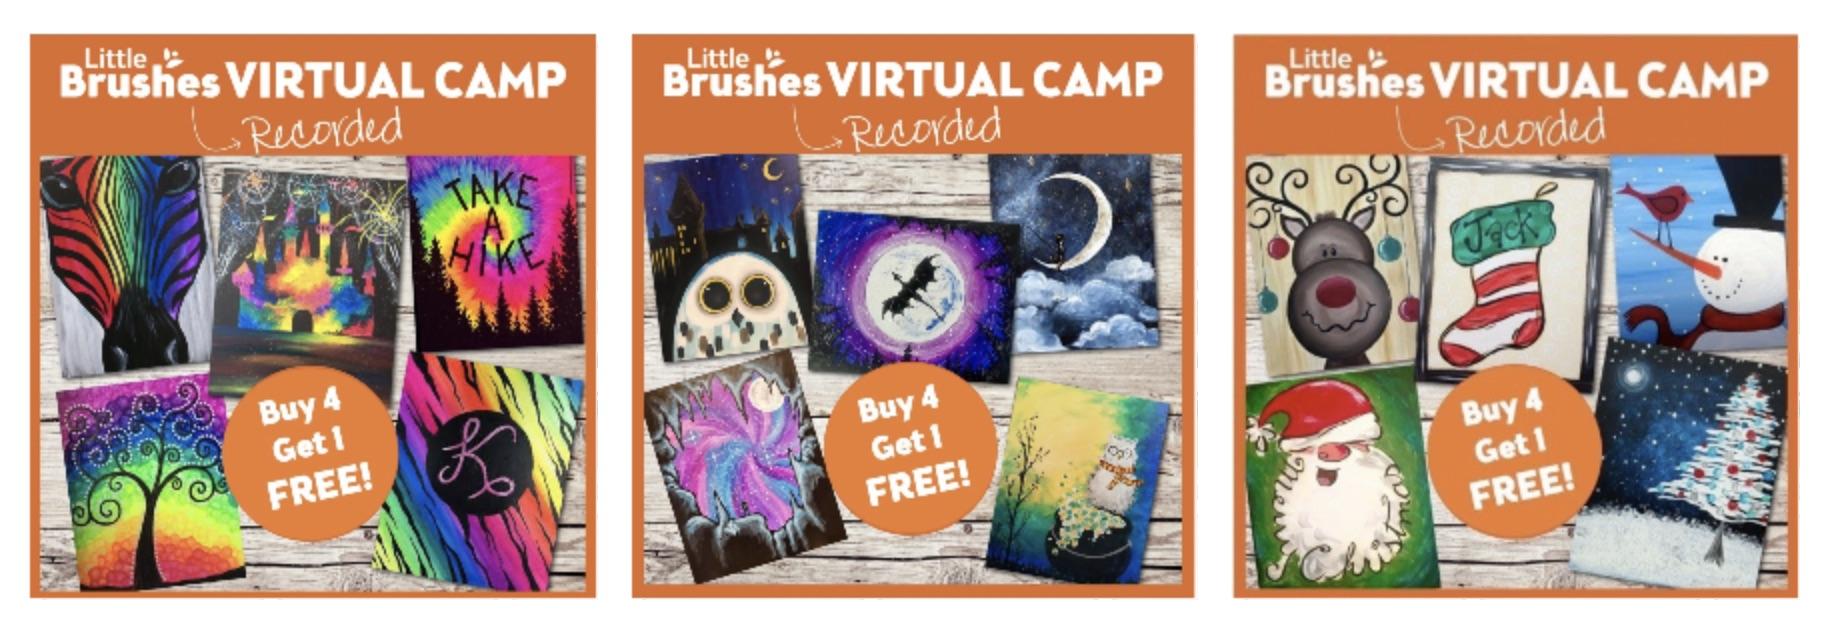 Virtual Kids Camp Kits are here!